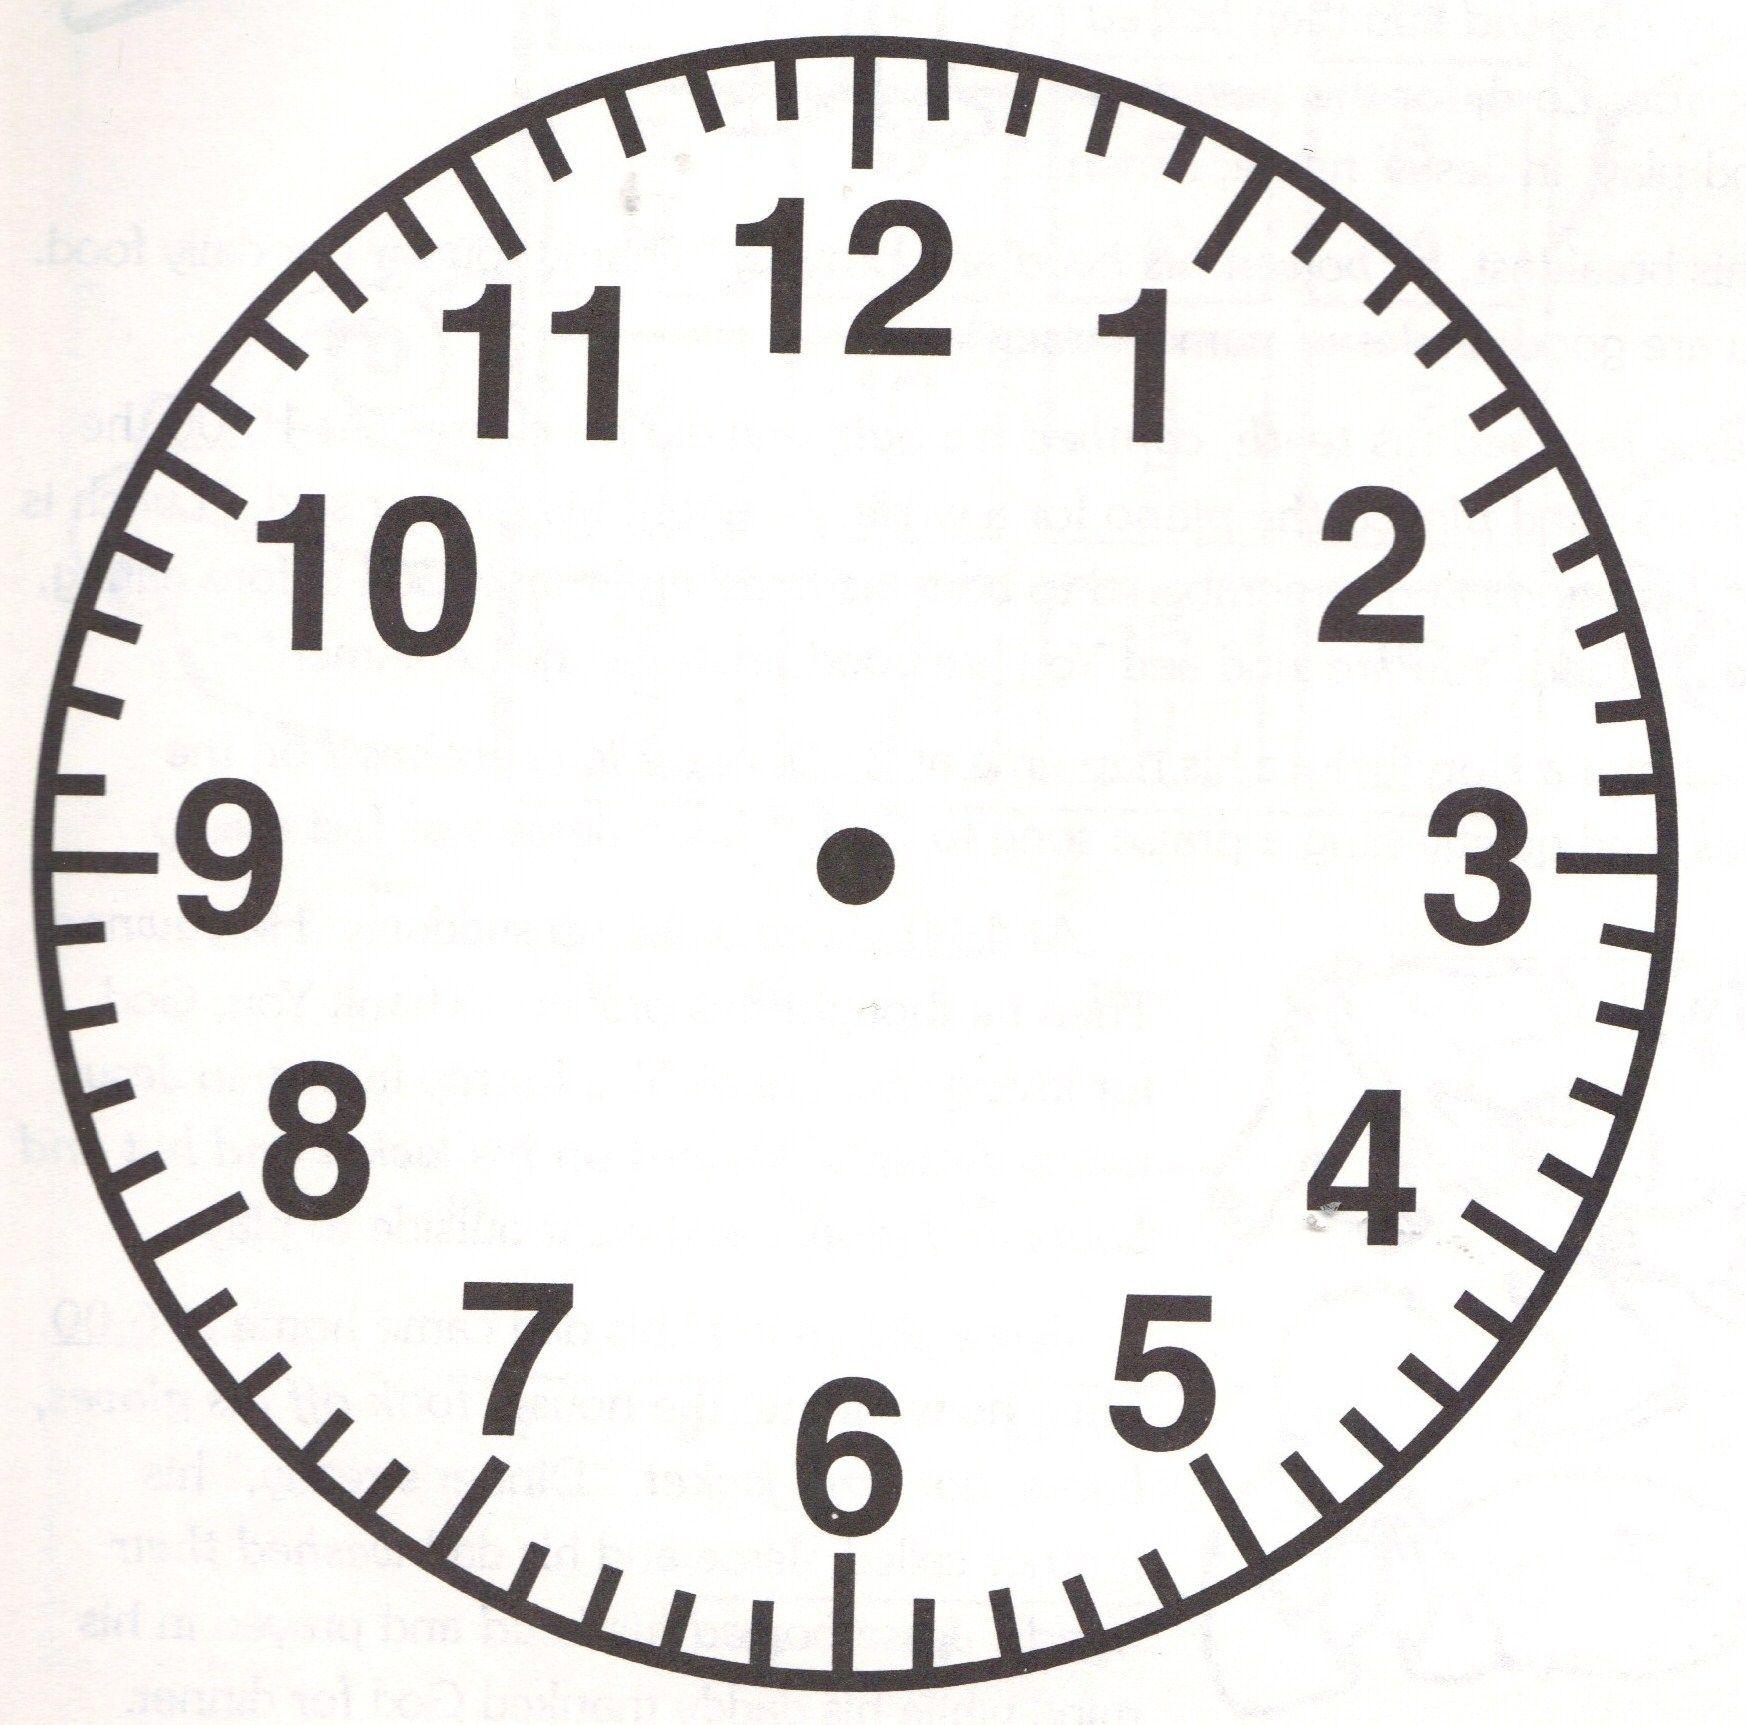 Image result for analog clock face | Education JP | Blank